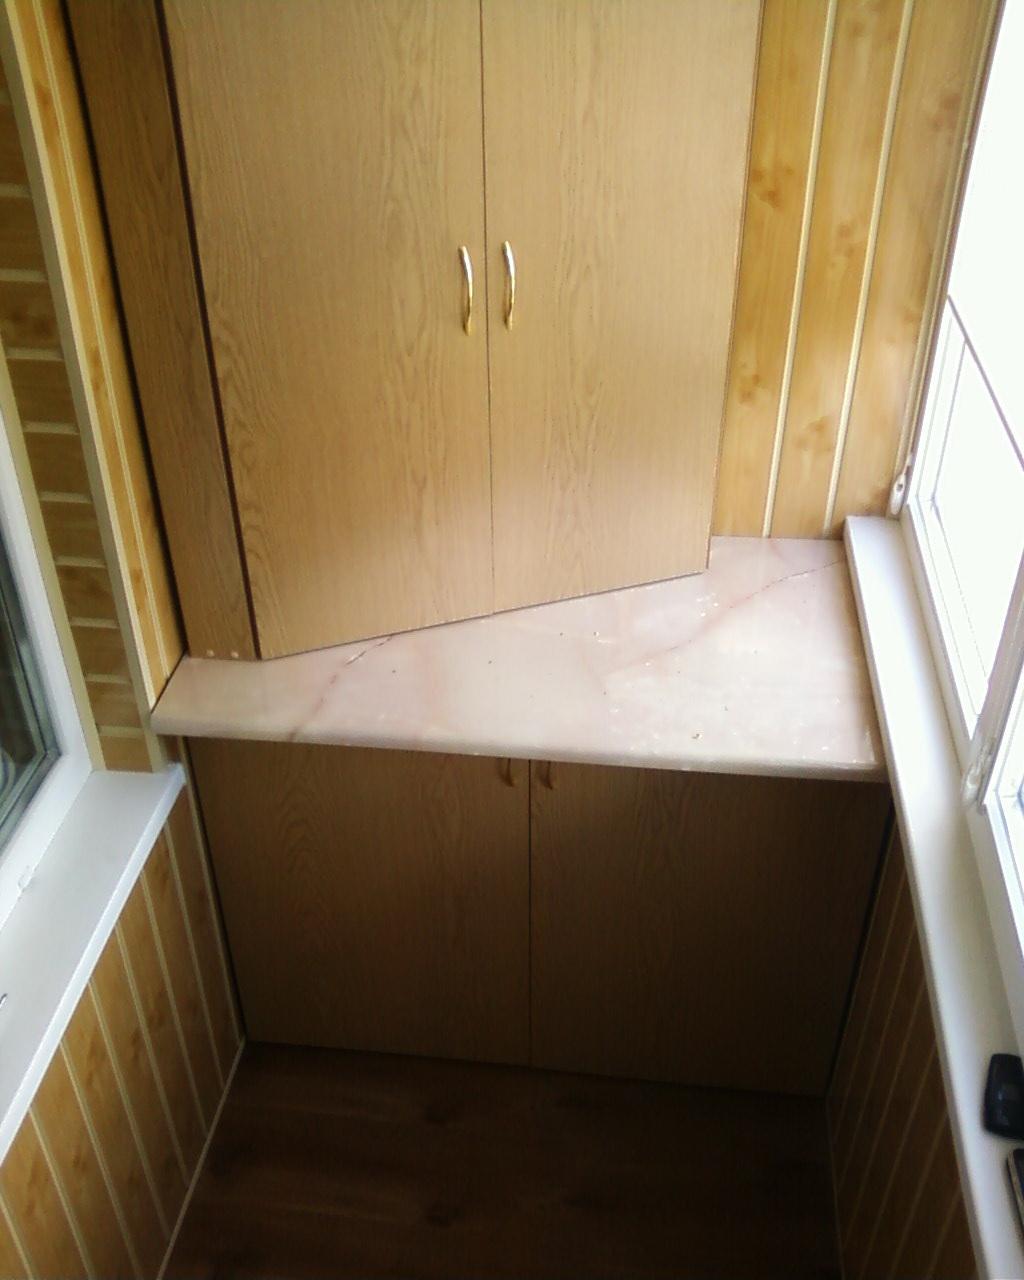 Шкаф лоджии своими руками с фото пошагово